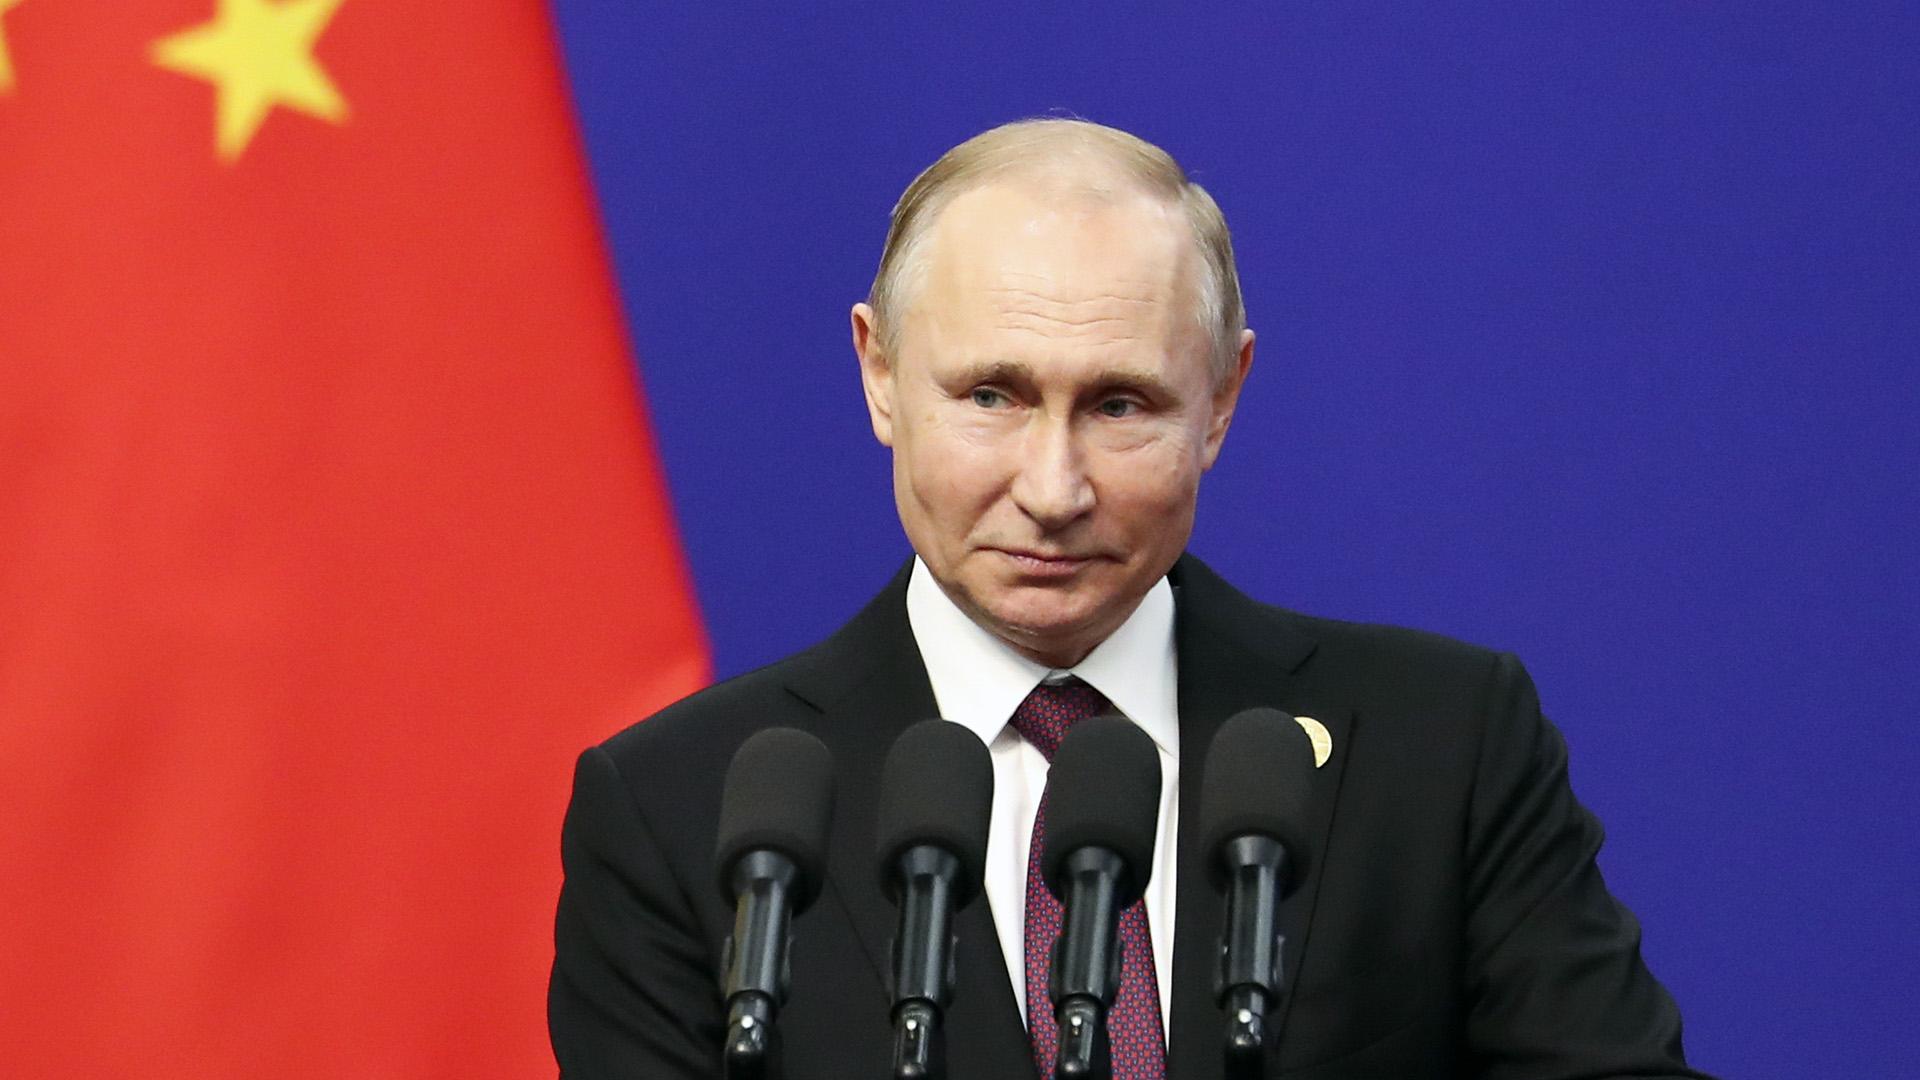 Vlad Jab: Putin Reveals He's Had The Sputnik V Vax